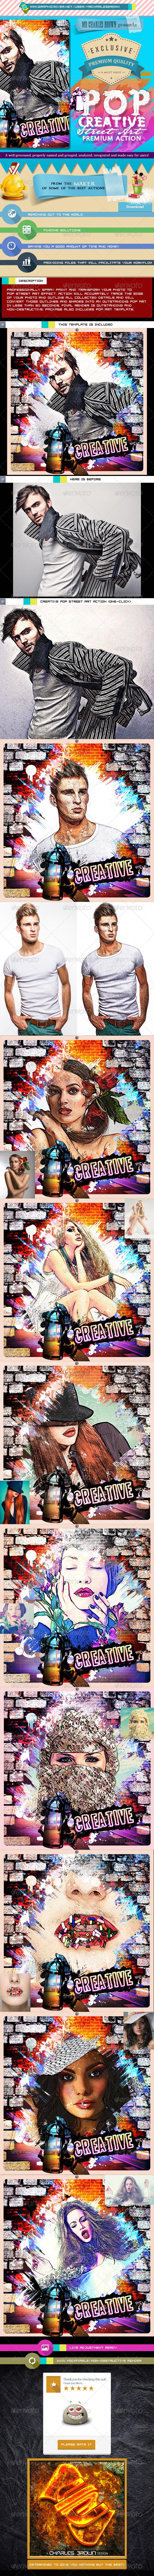 GraphicRiver Creative Pop Street Art 6397625